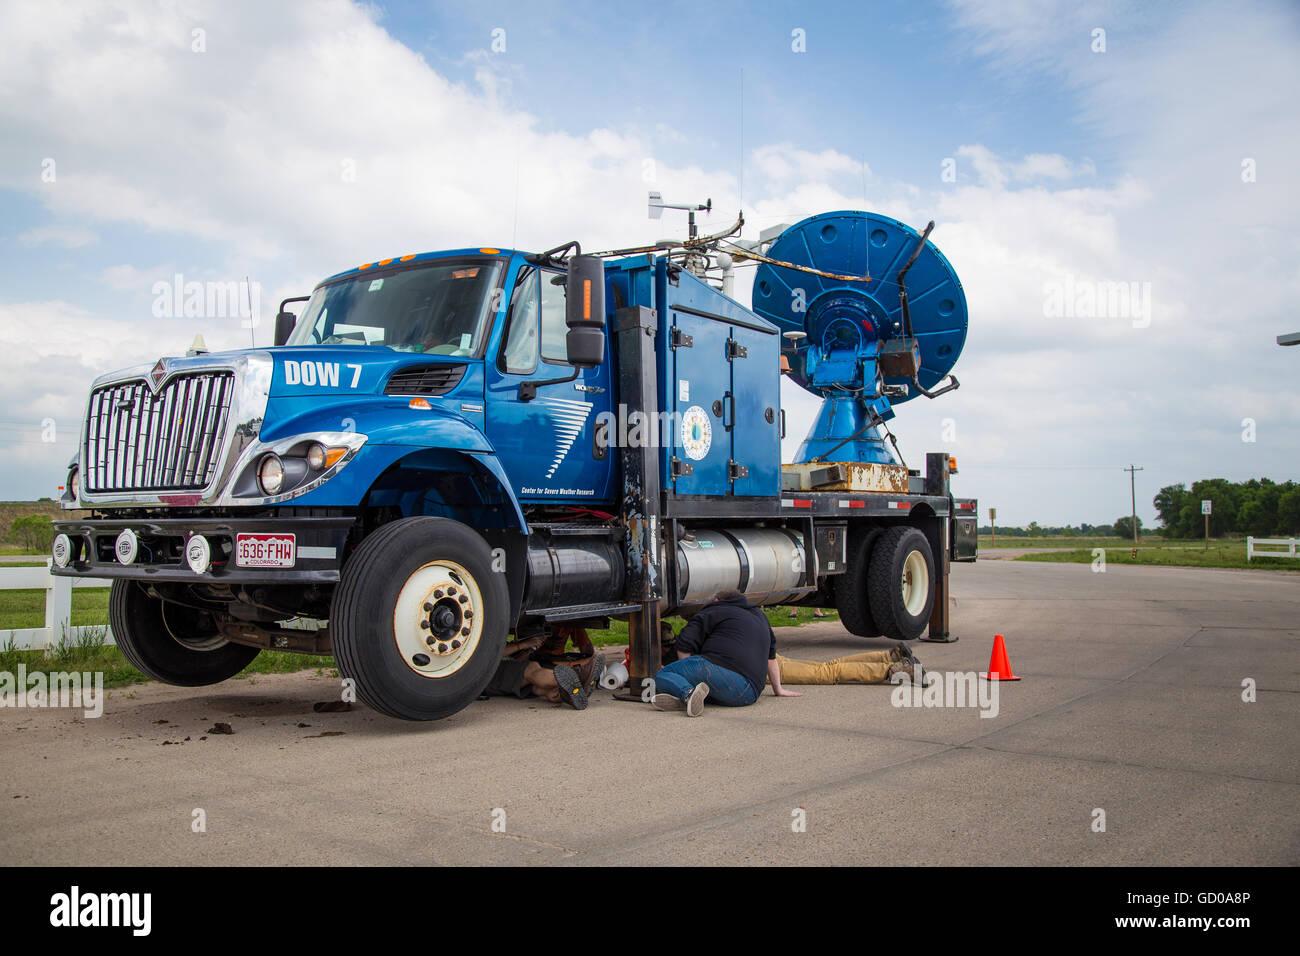 maintenance truck stockfotos maintenance truck bilder. Black Bedroom Furniture Sets. Home Design Ideas